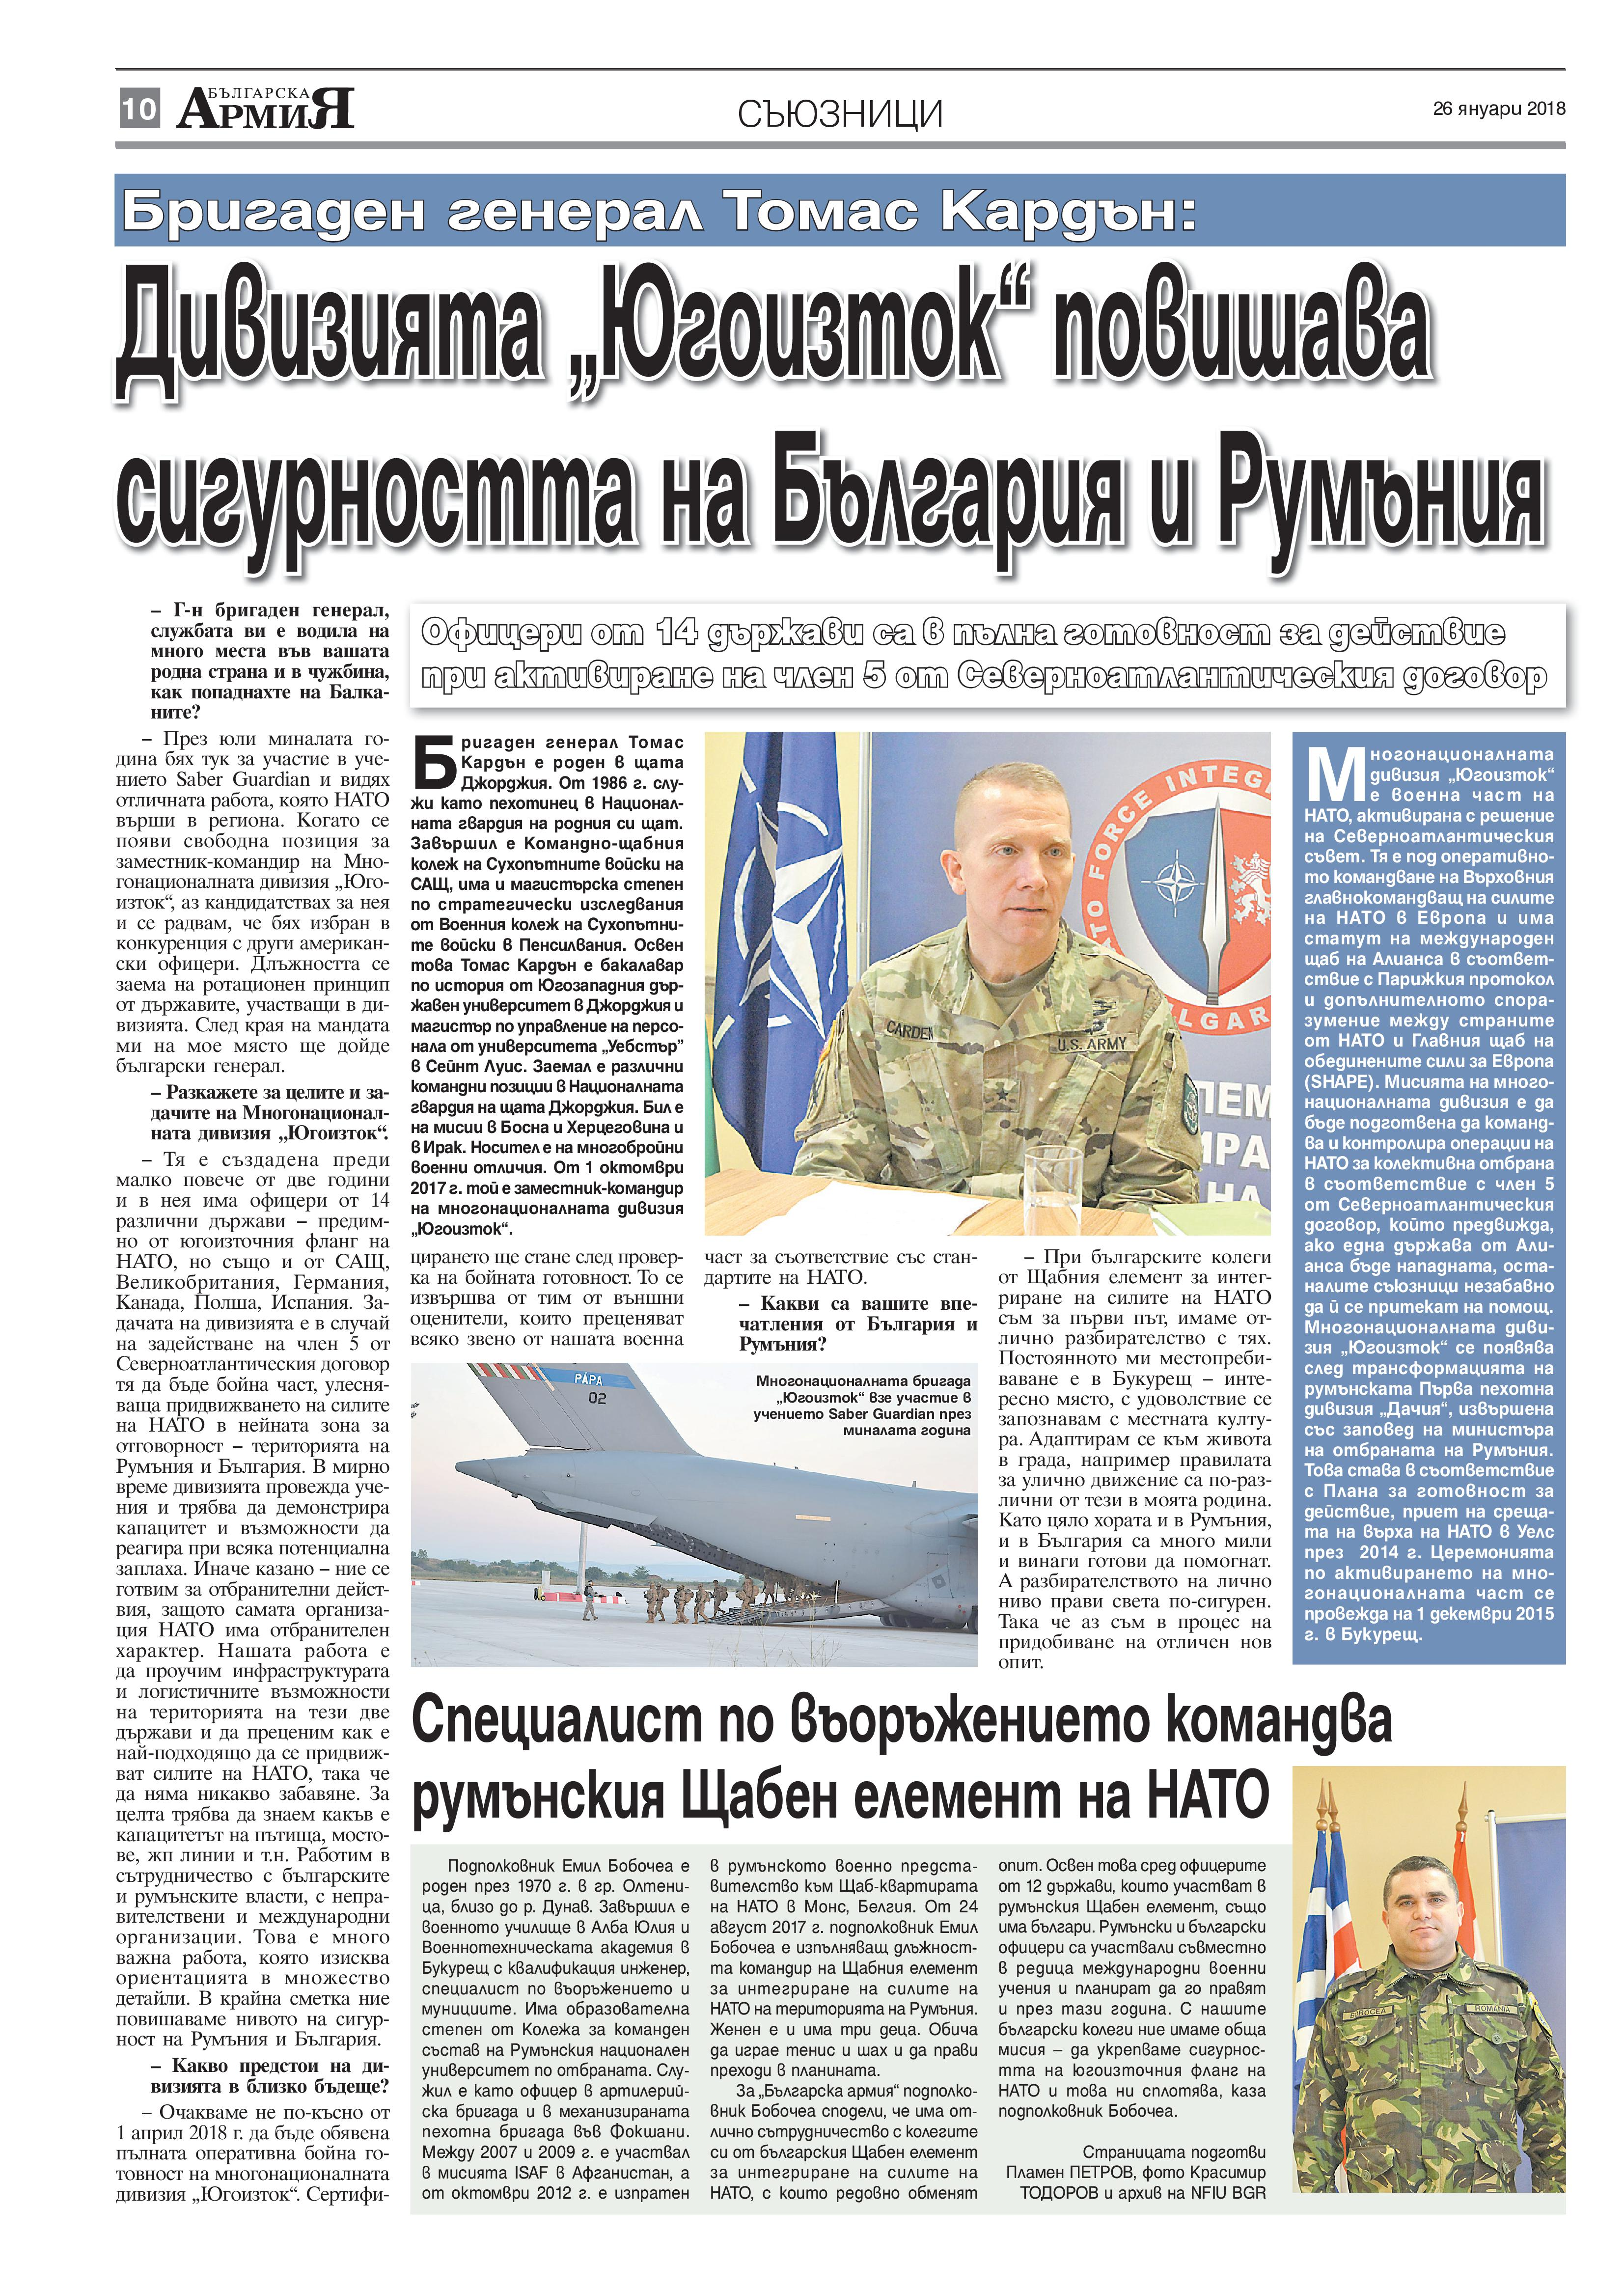 https://armymedia.bg/wp-content/uploads/2015/06/10-18.jpg